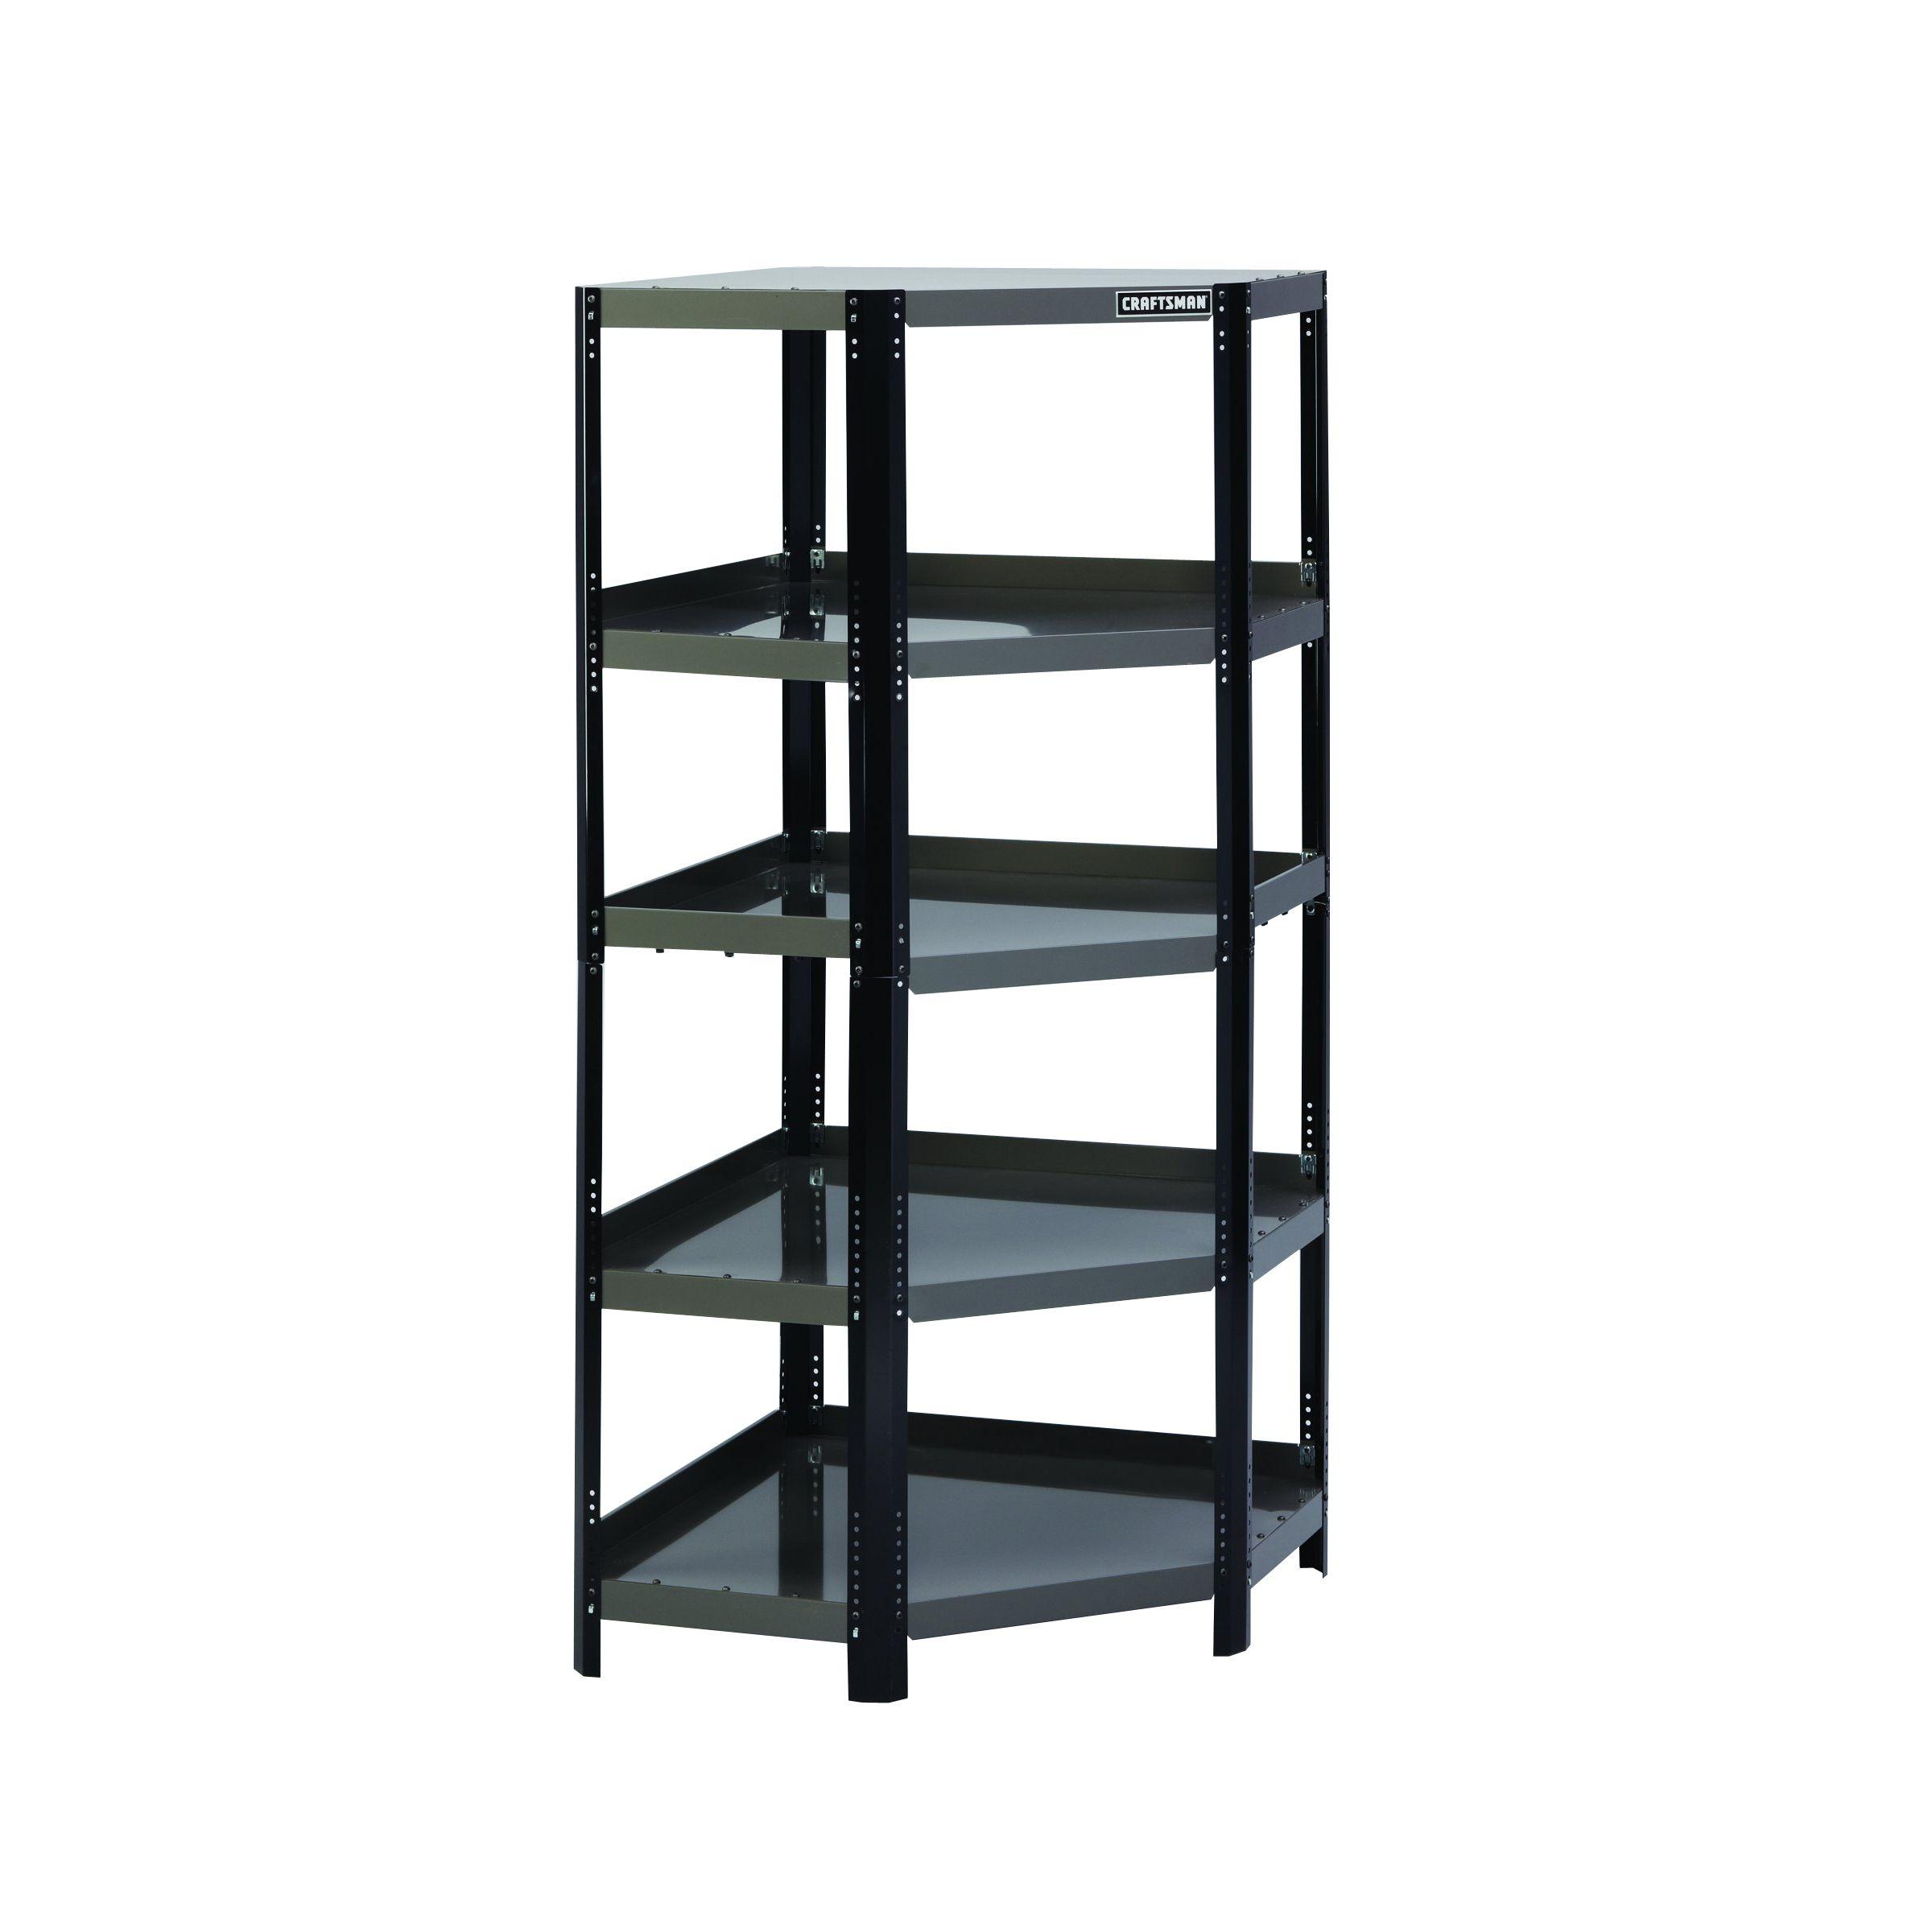 craftsman corner steel shelving unit  blackplatinum -